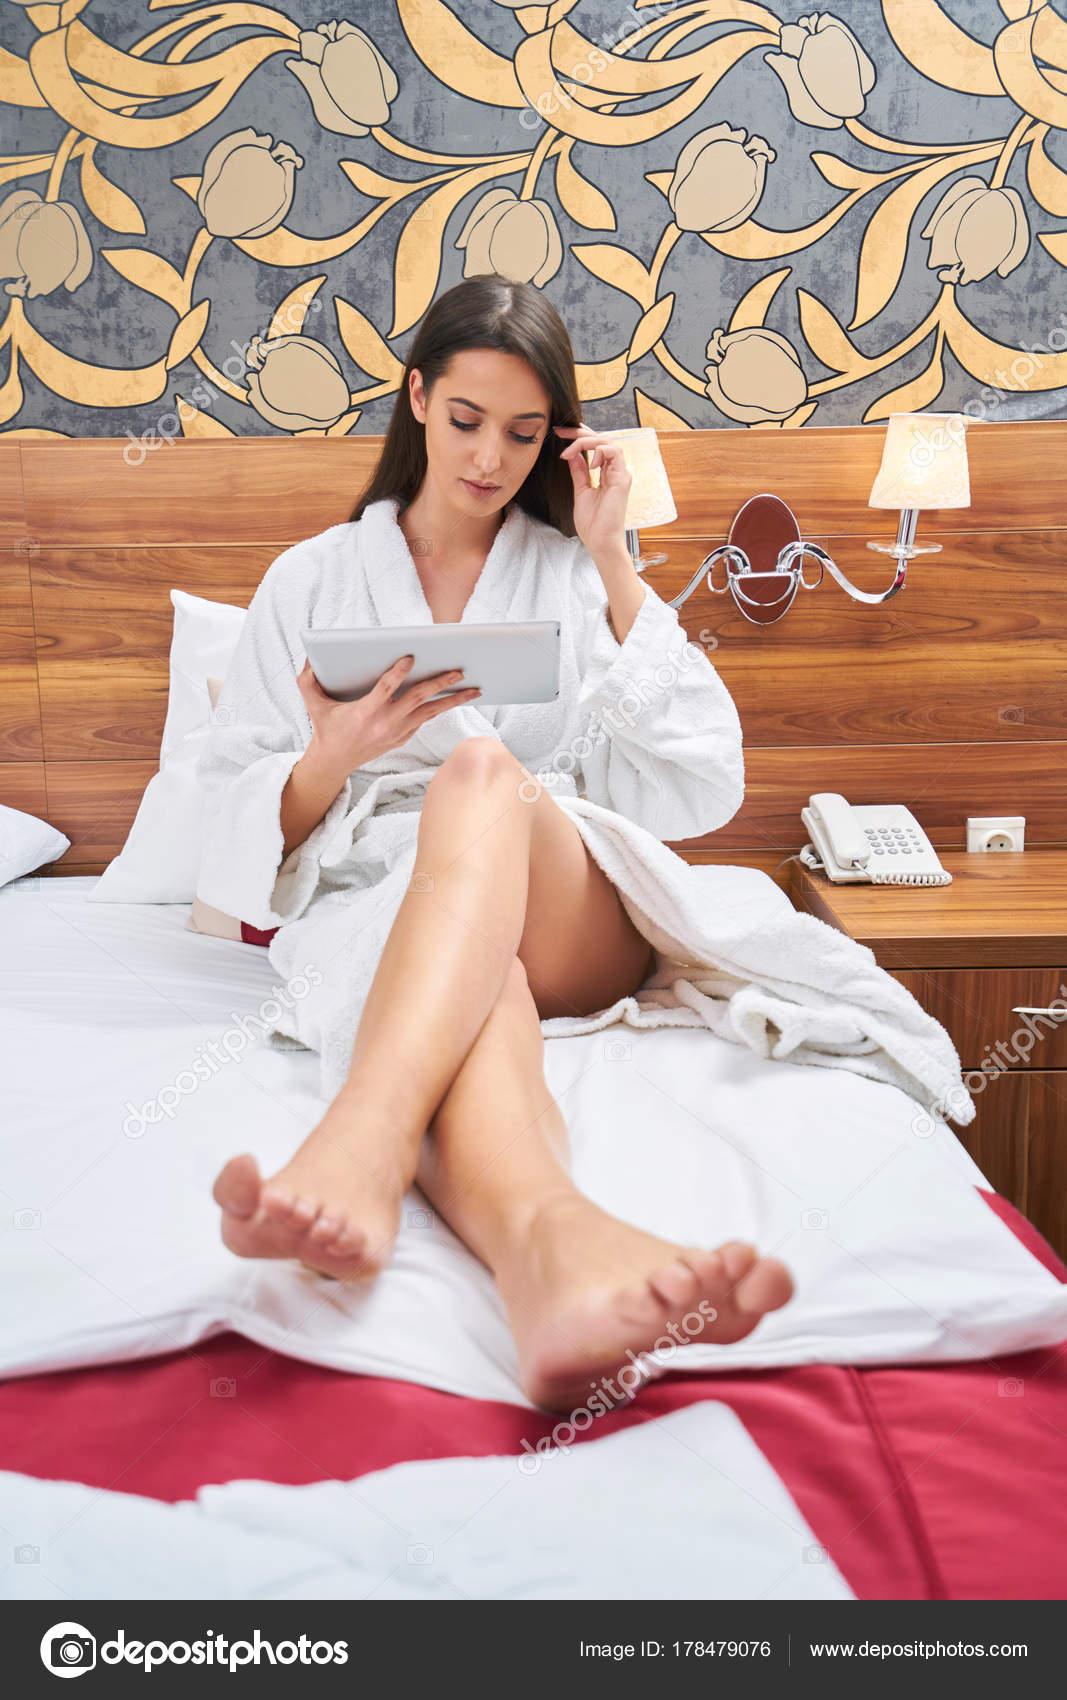 opinion useful advise sexy girl masturbation video apologise, but